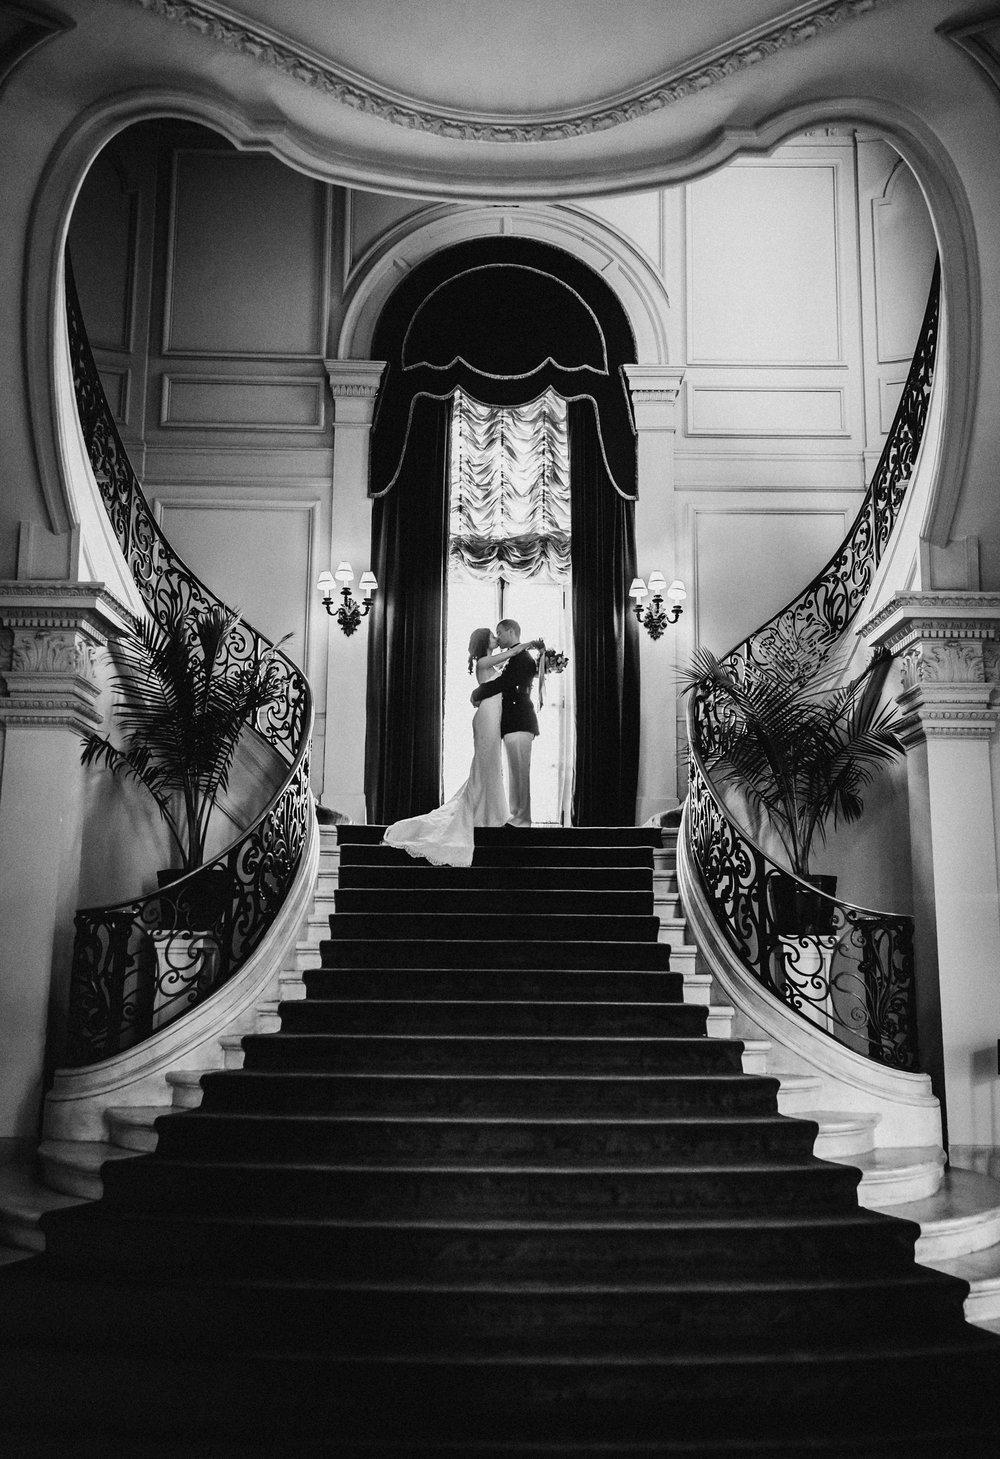 Rosecliff-Mansion-Wedding-Newport-23.jpg